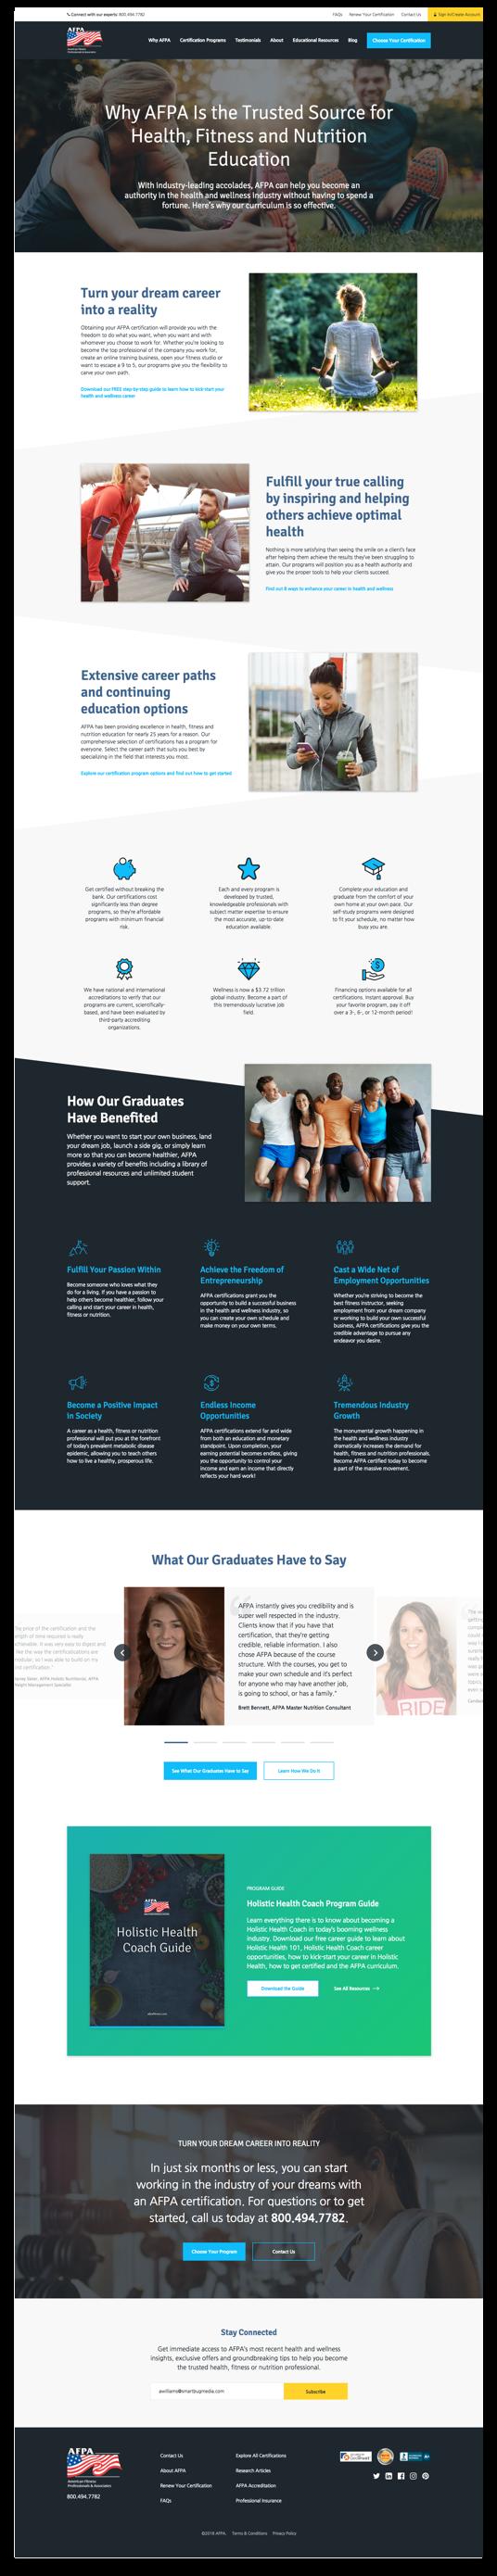 AFPA web design ux